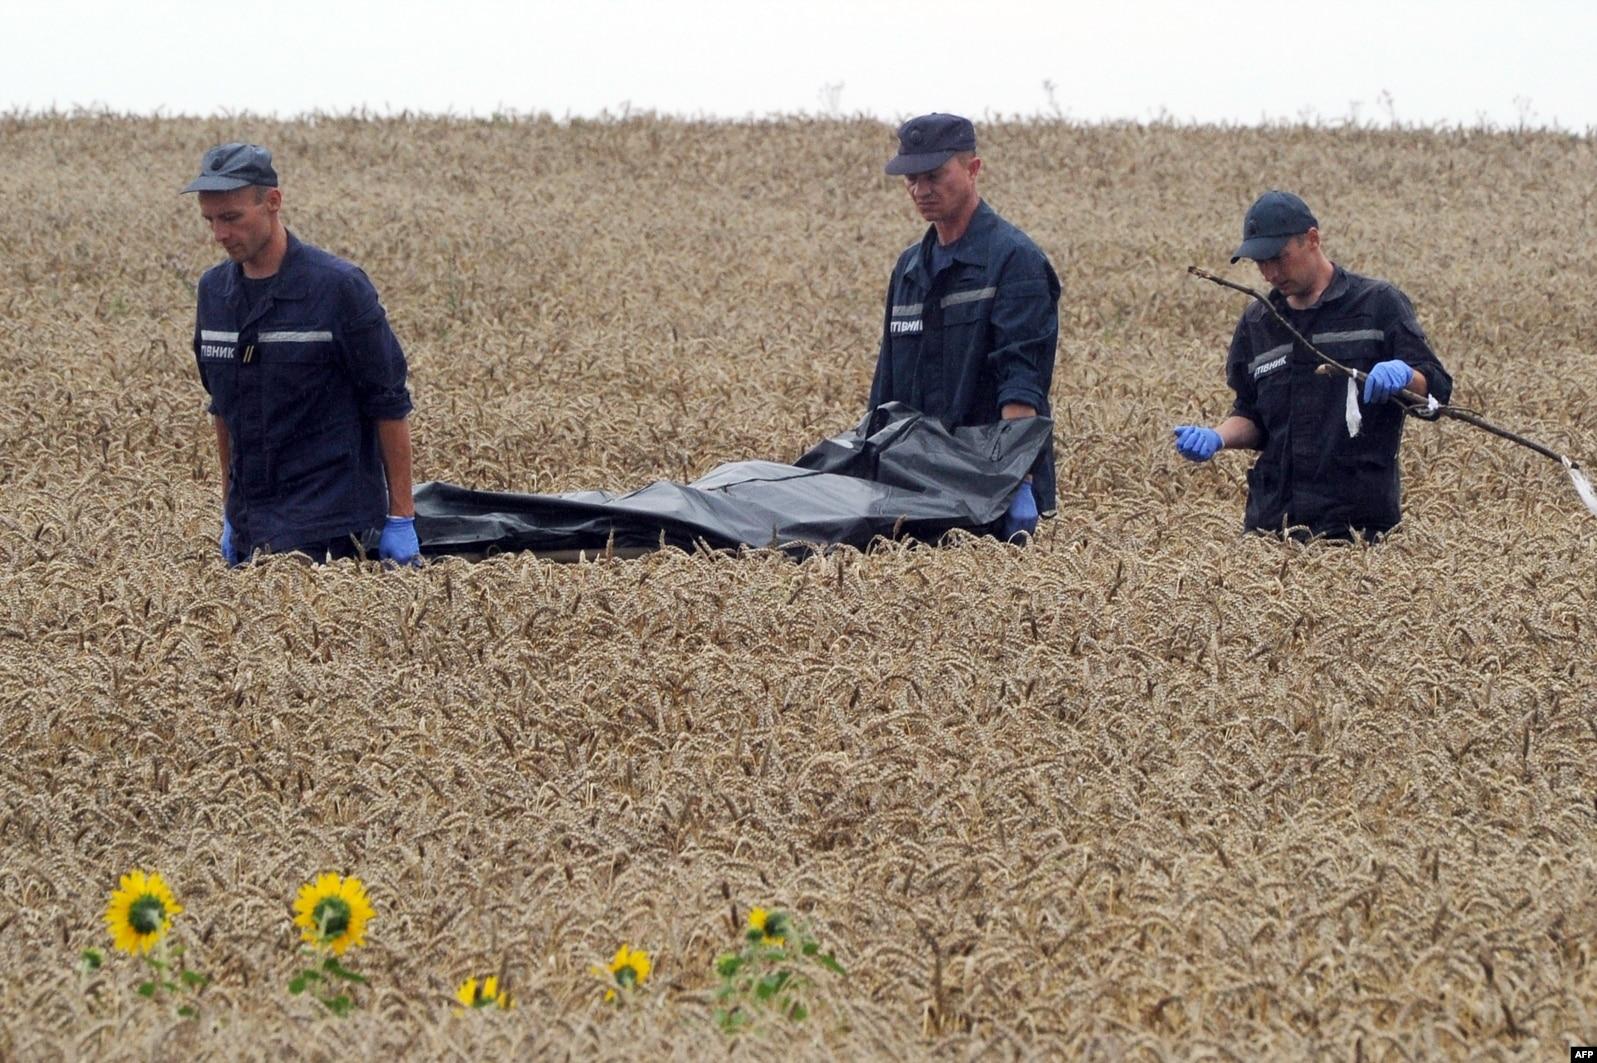 قۇتقارۋشىلار MH17 ۇشاعى قۇلاعان ورىندا تابىلعان مايىتتەردى اكەتىپ بارادى. 19 شىلدە 2014 جىل.